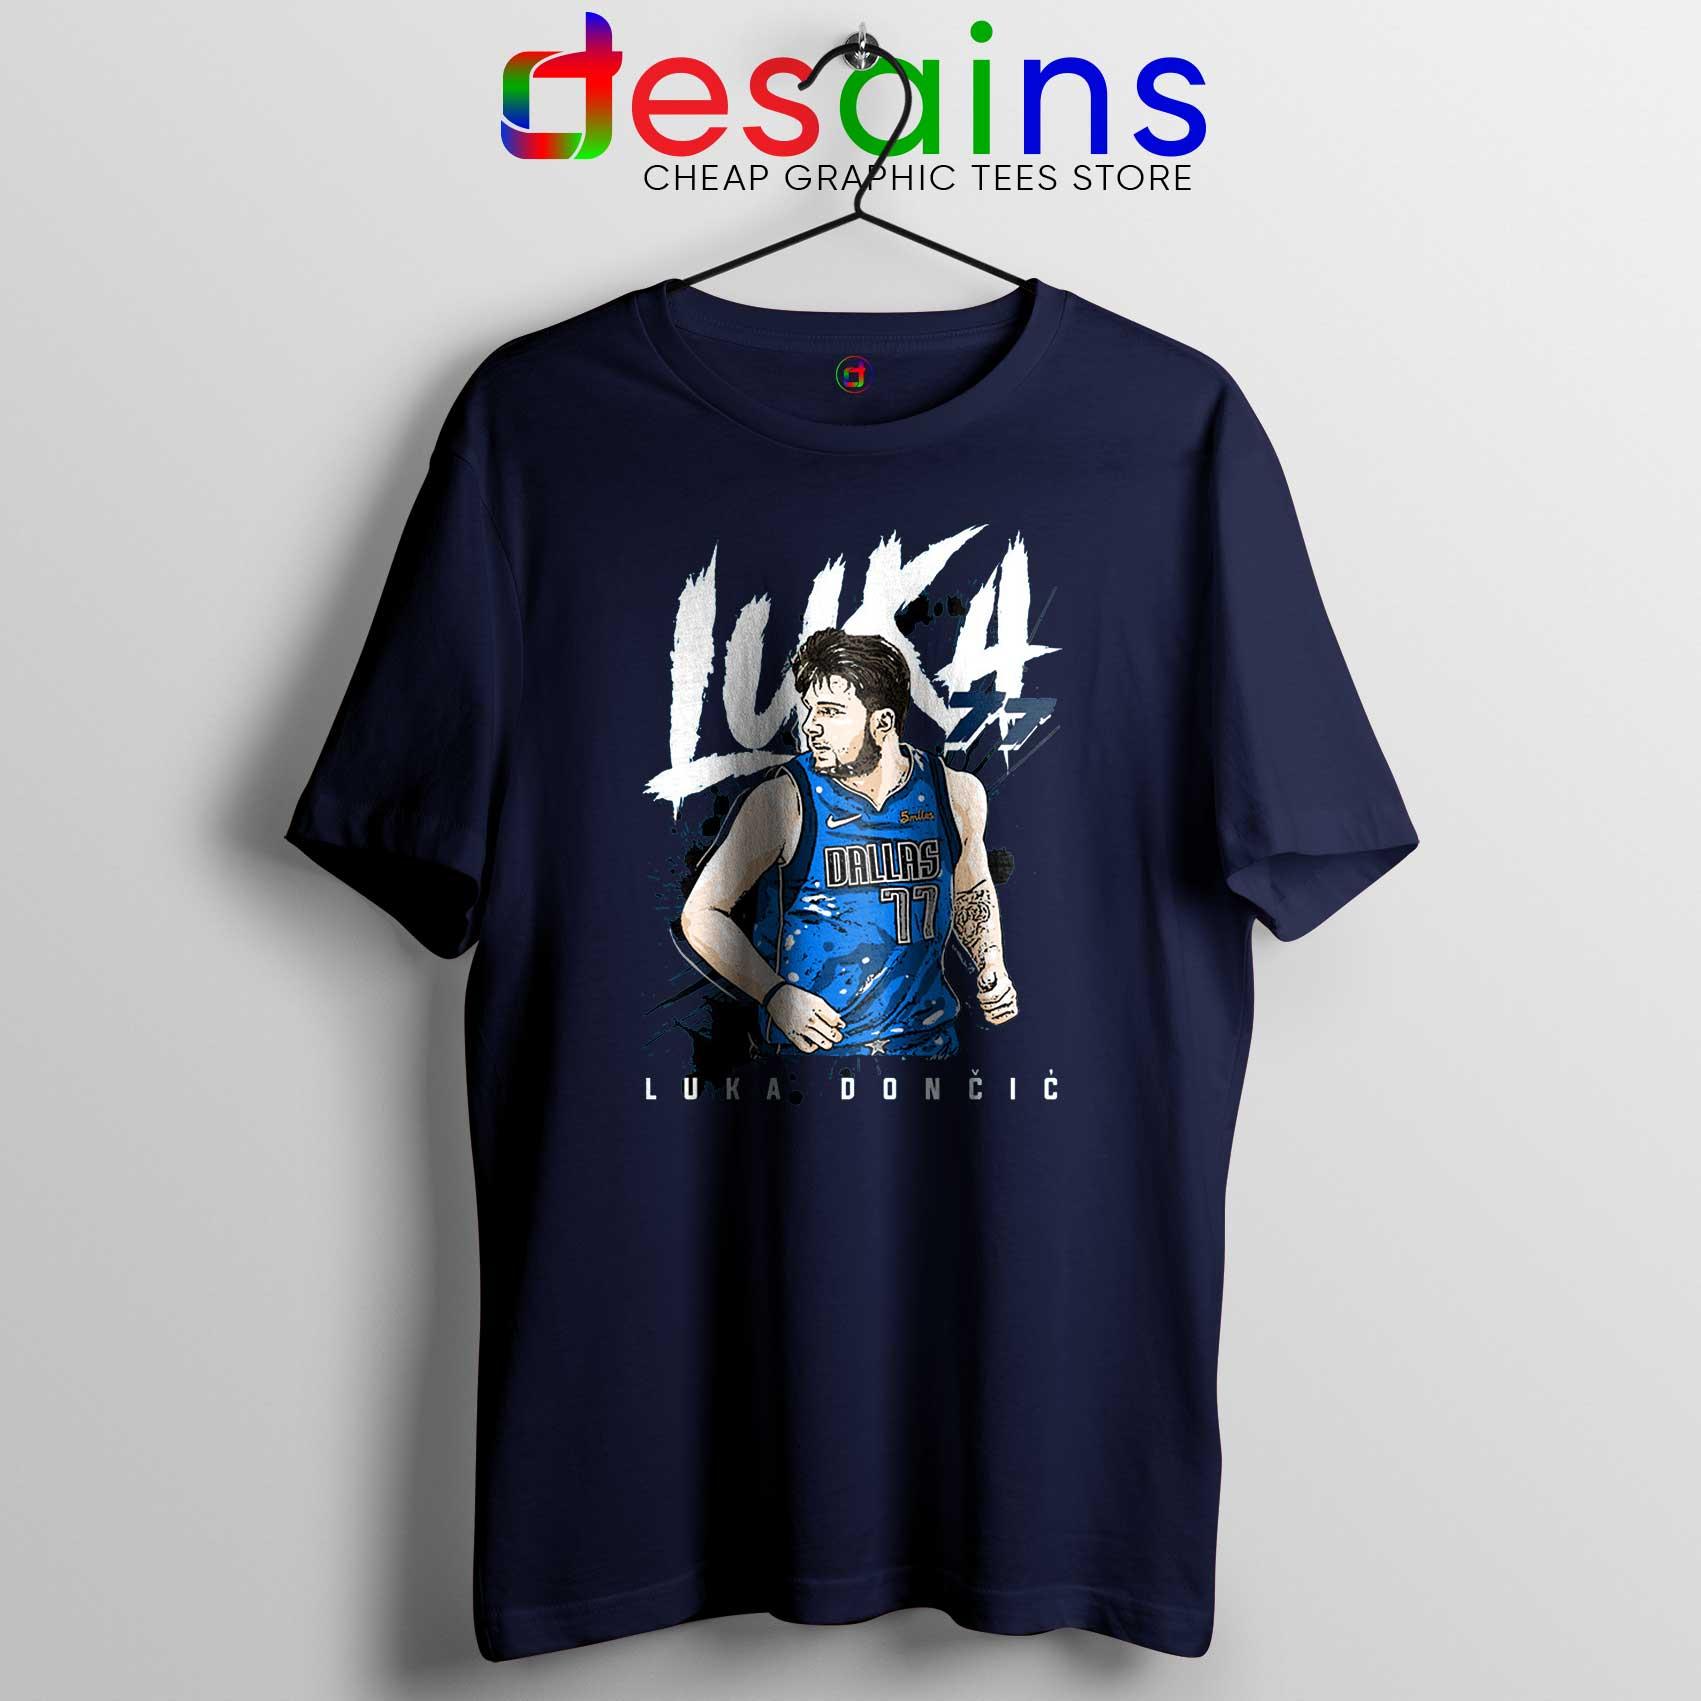 quality design 3255b a4451 Cheap Tee Shirts Luka Doncic Dallas Mavericks art Size S-3XL